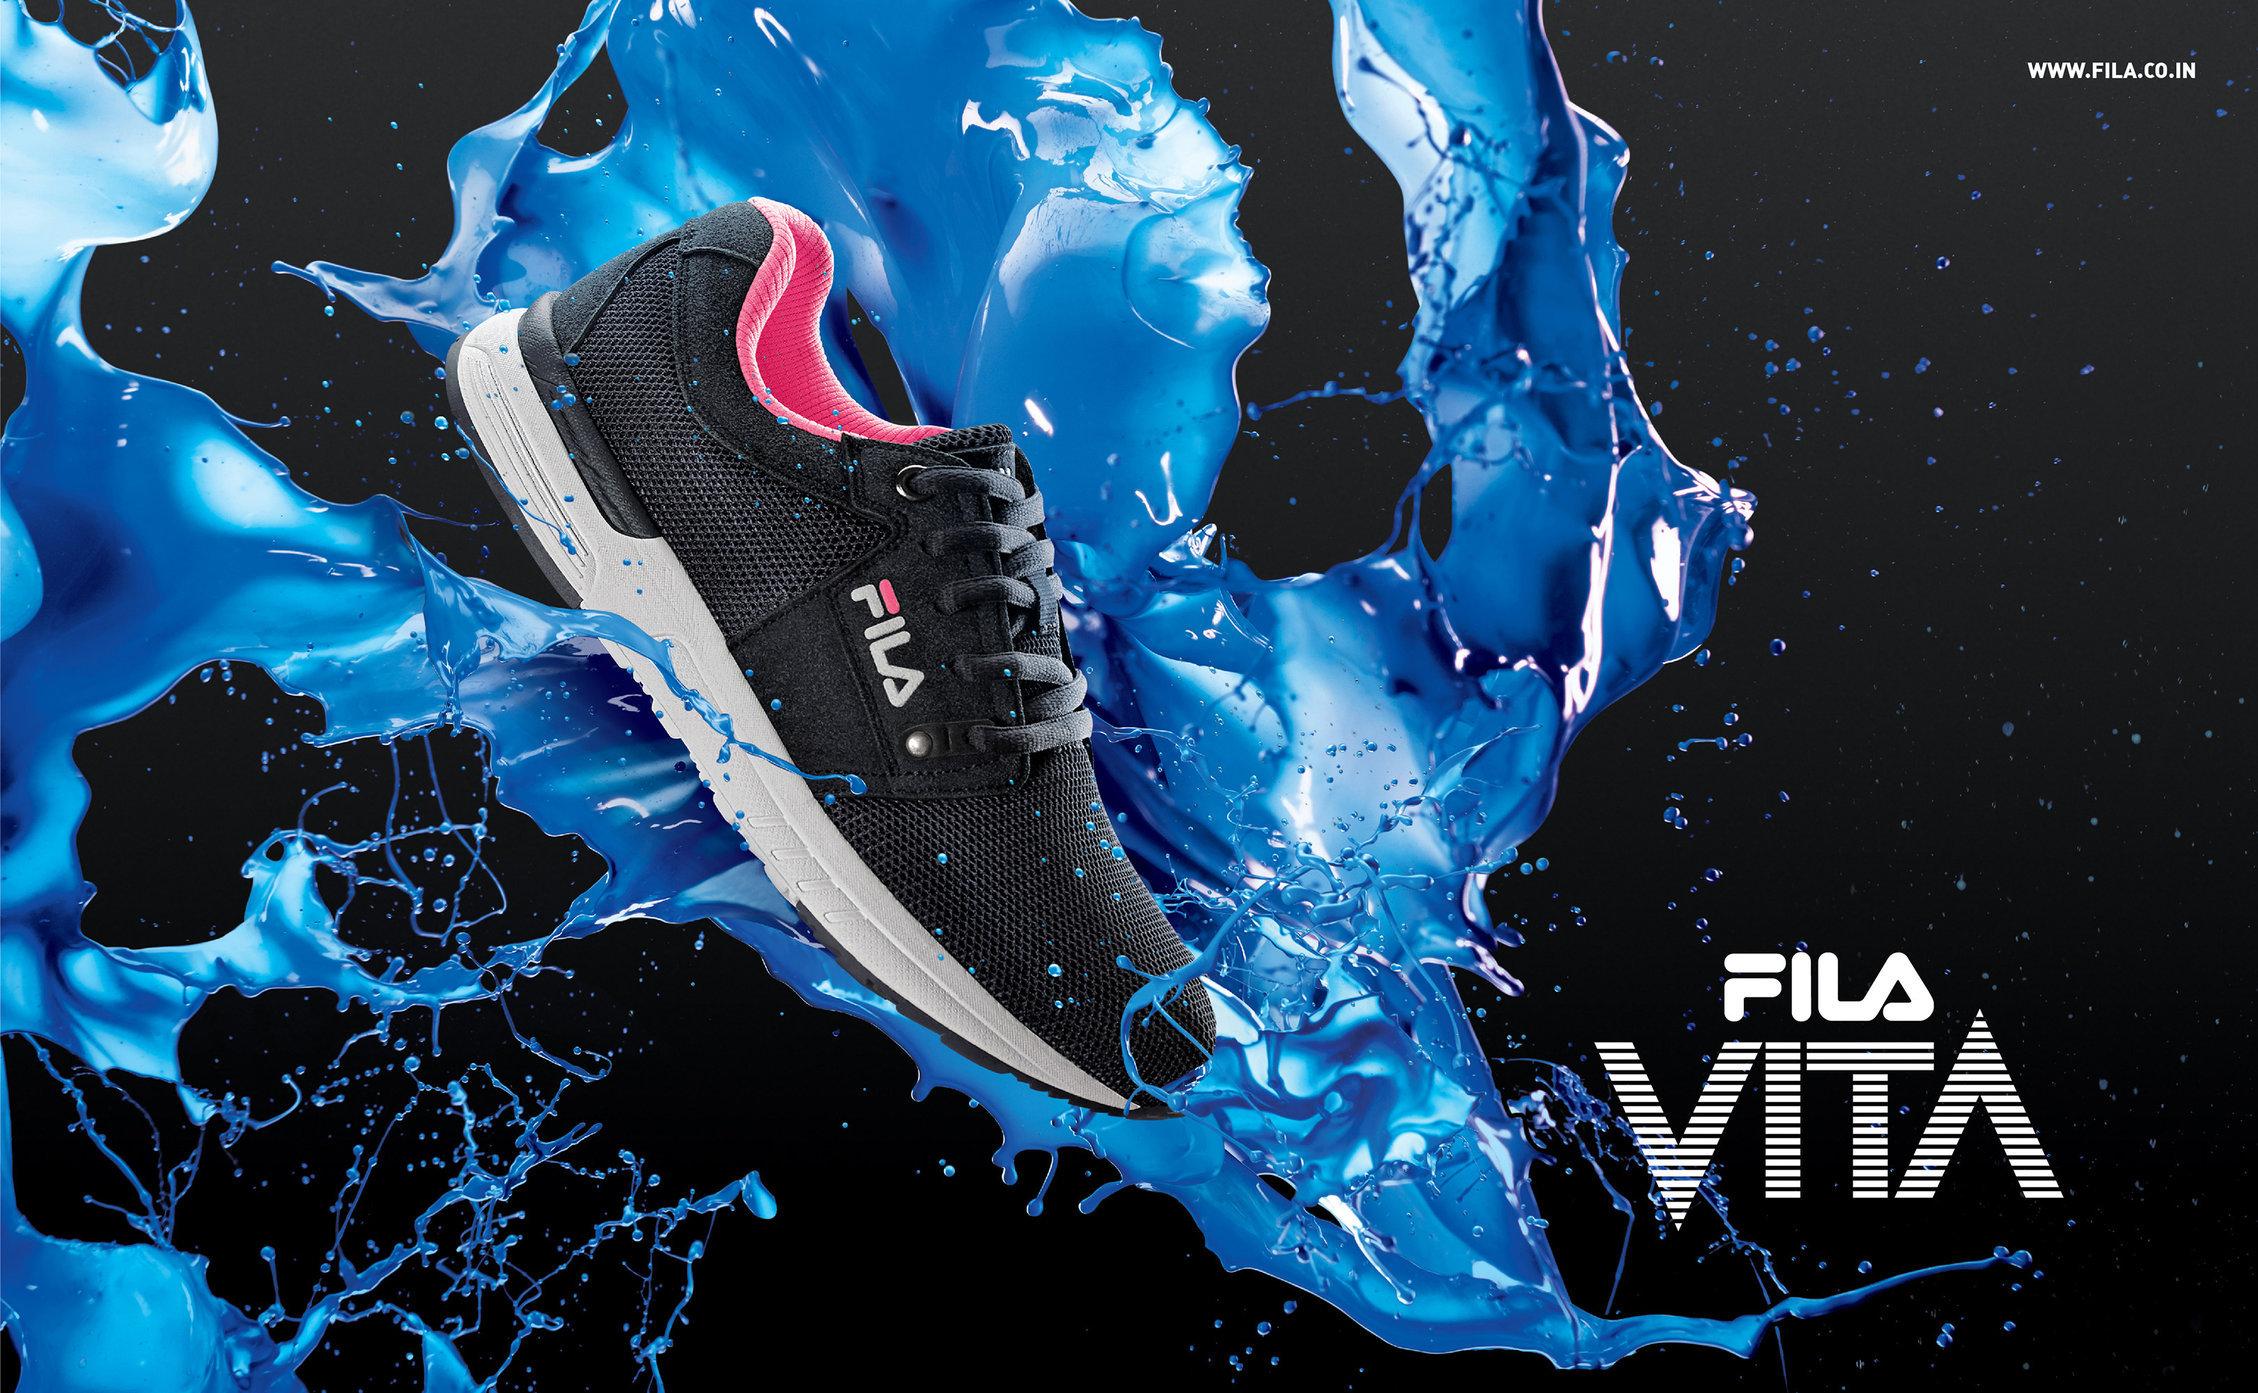 Fila SS17 Ad campaign 1 copy.jpg